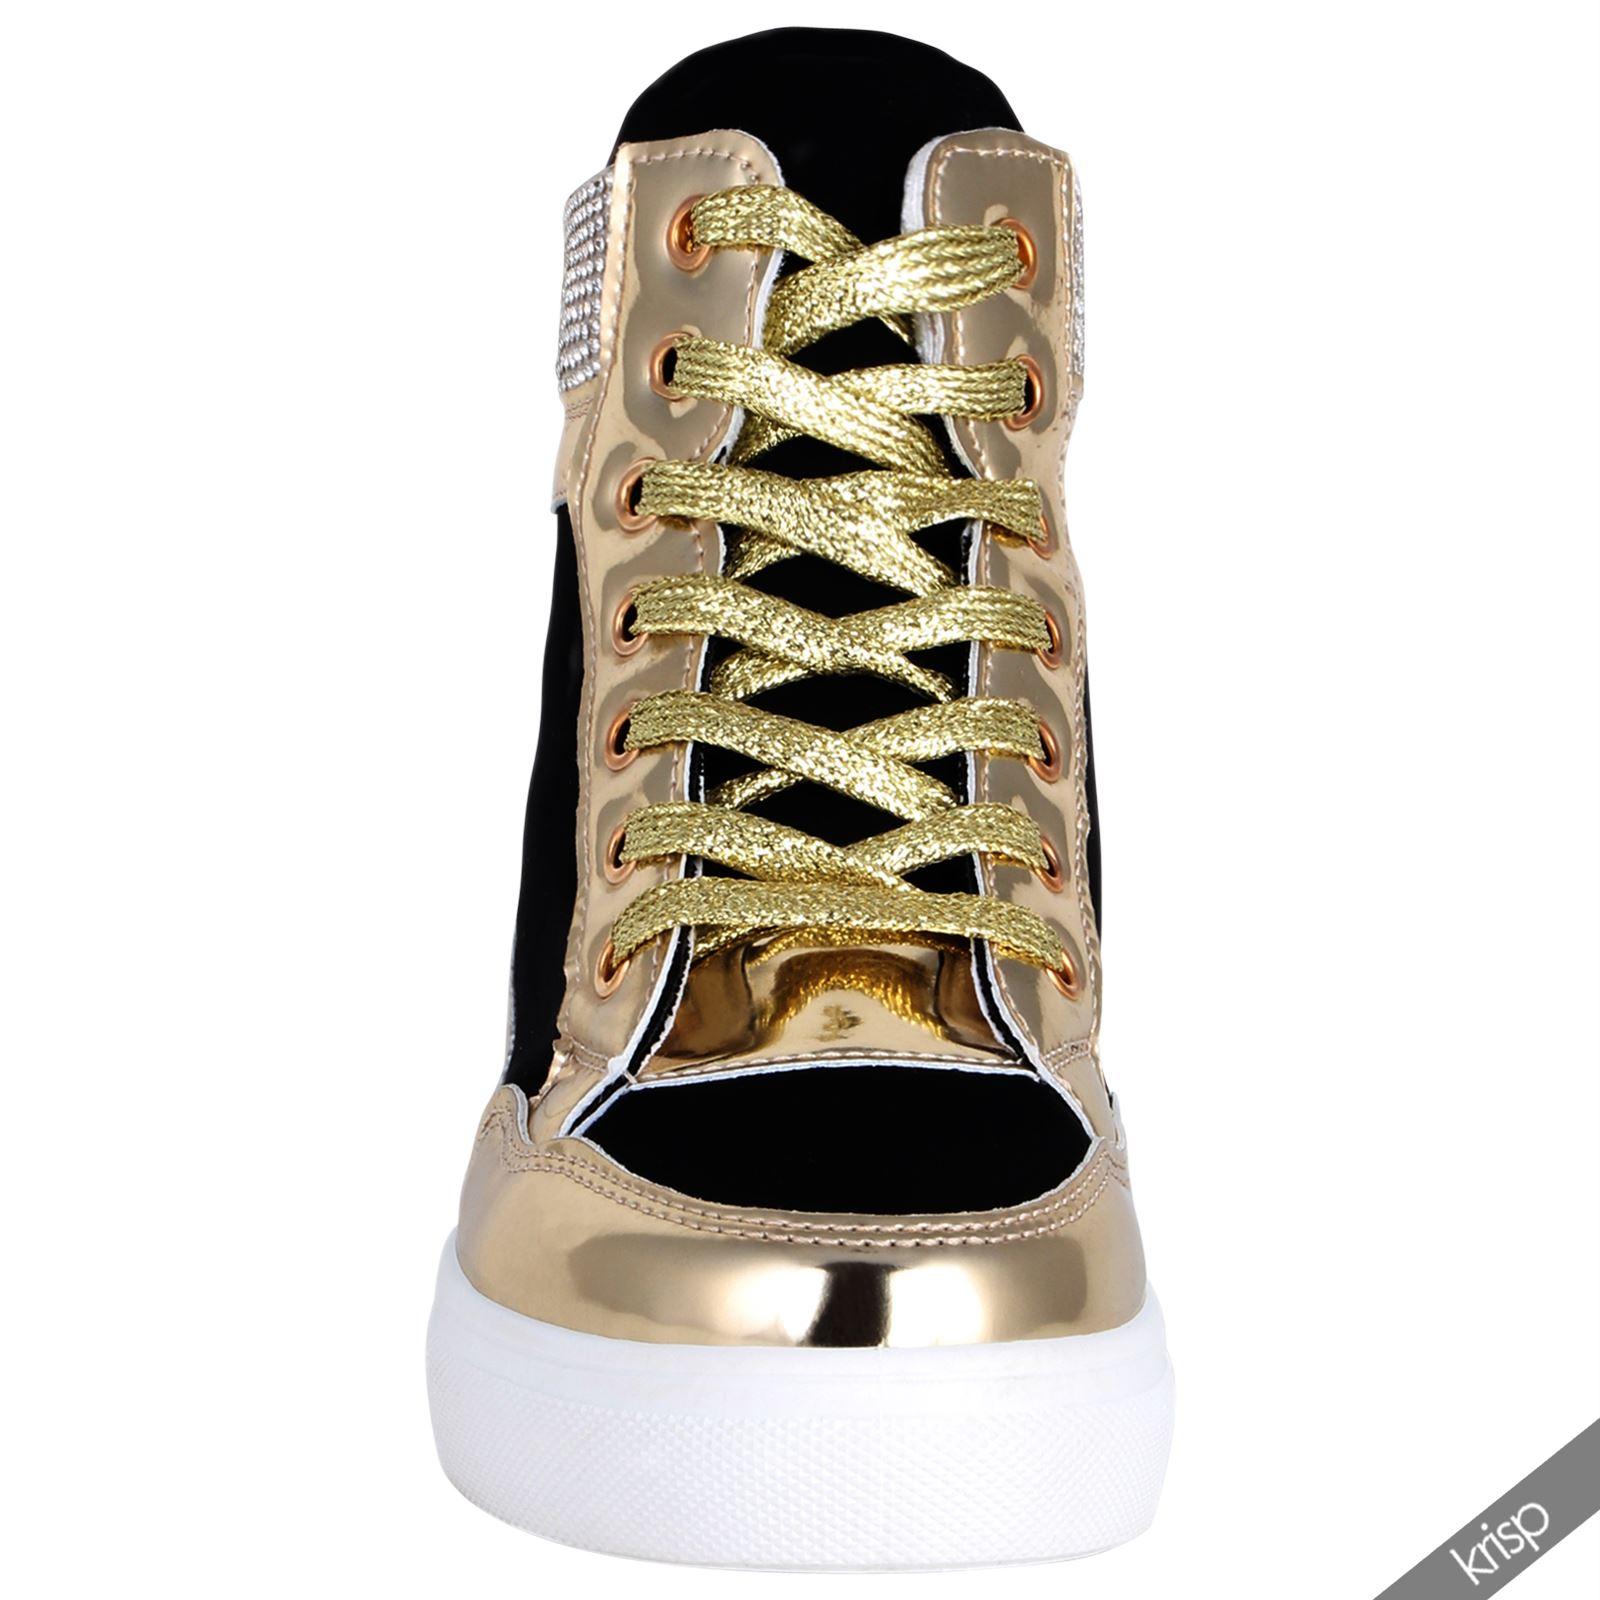 Model Womens Fashion Studded Ankle Biker Boots Low Heel Rock Punk Buckle Strap Shoes | EBay